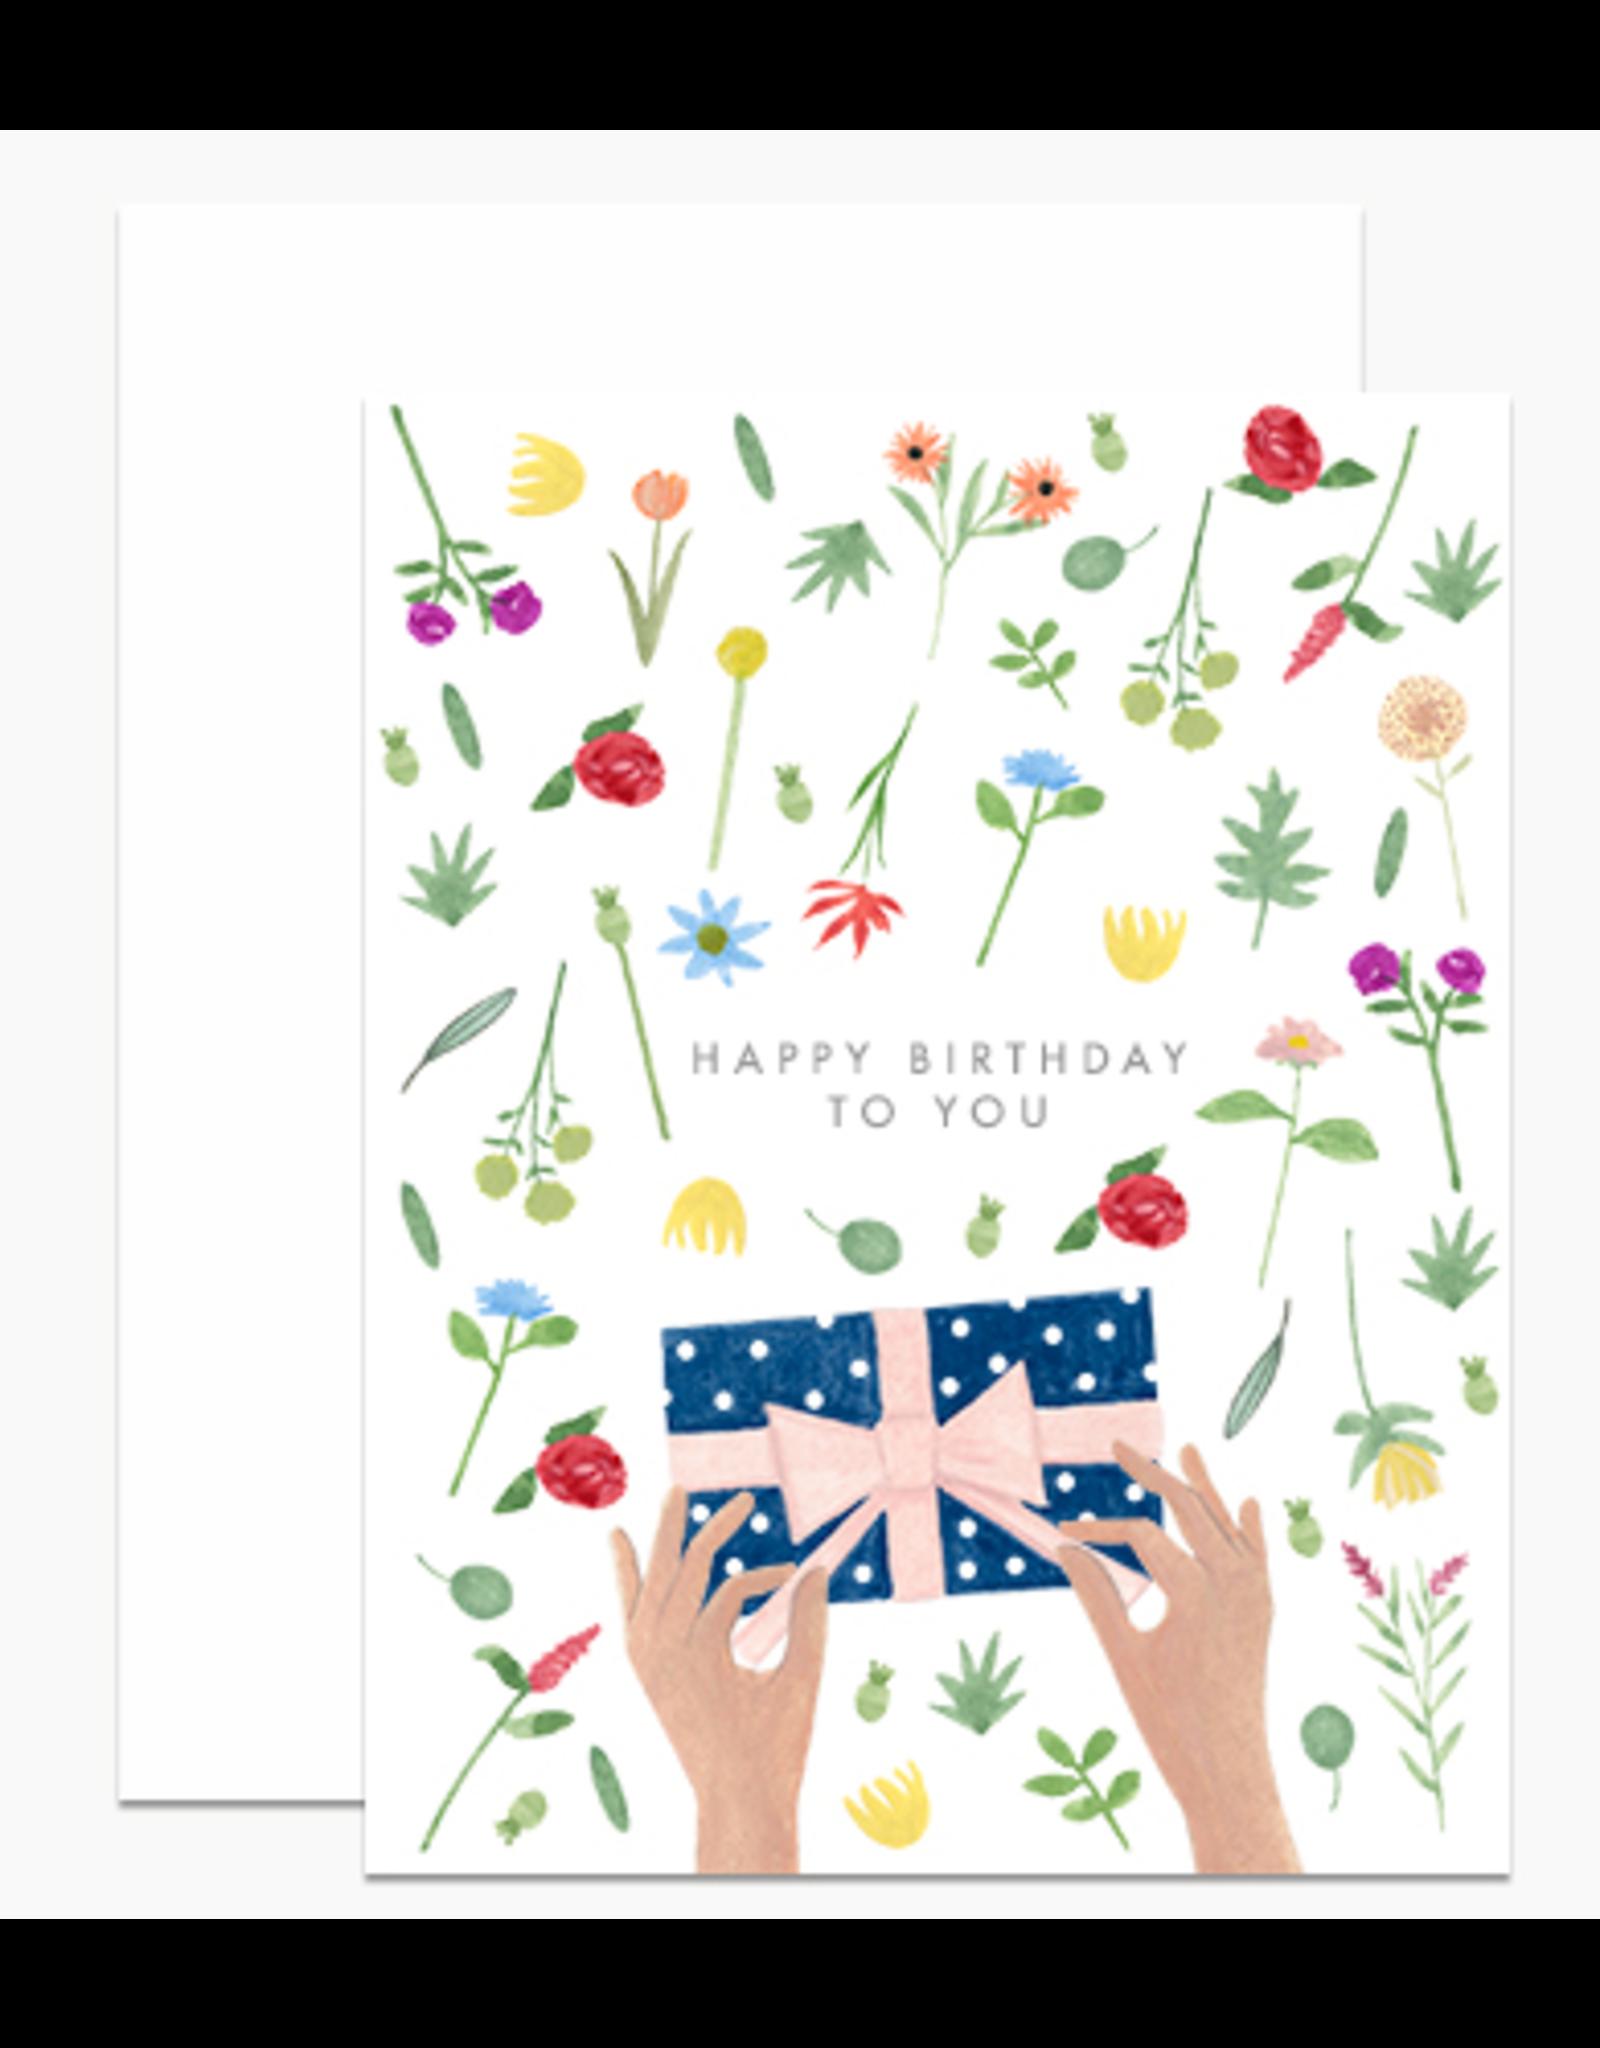 Dear Hancock Wrapping Present Card